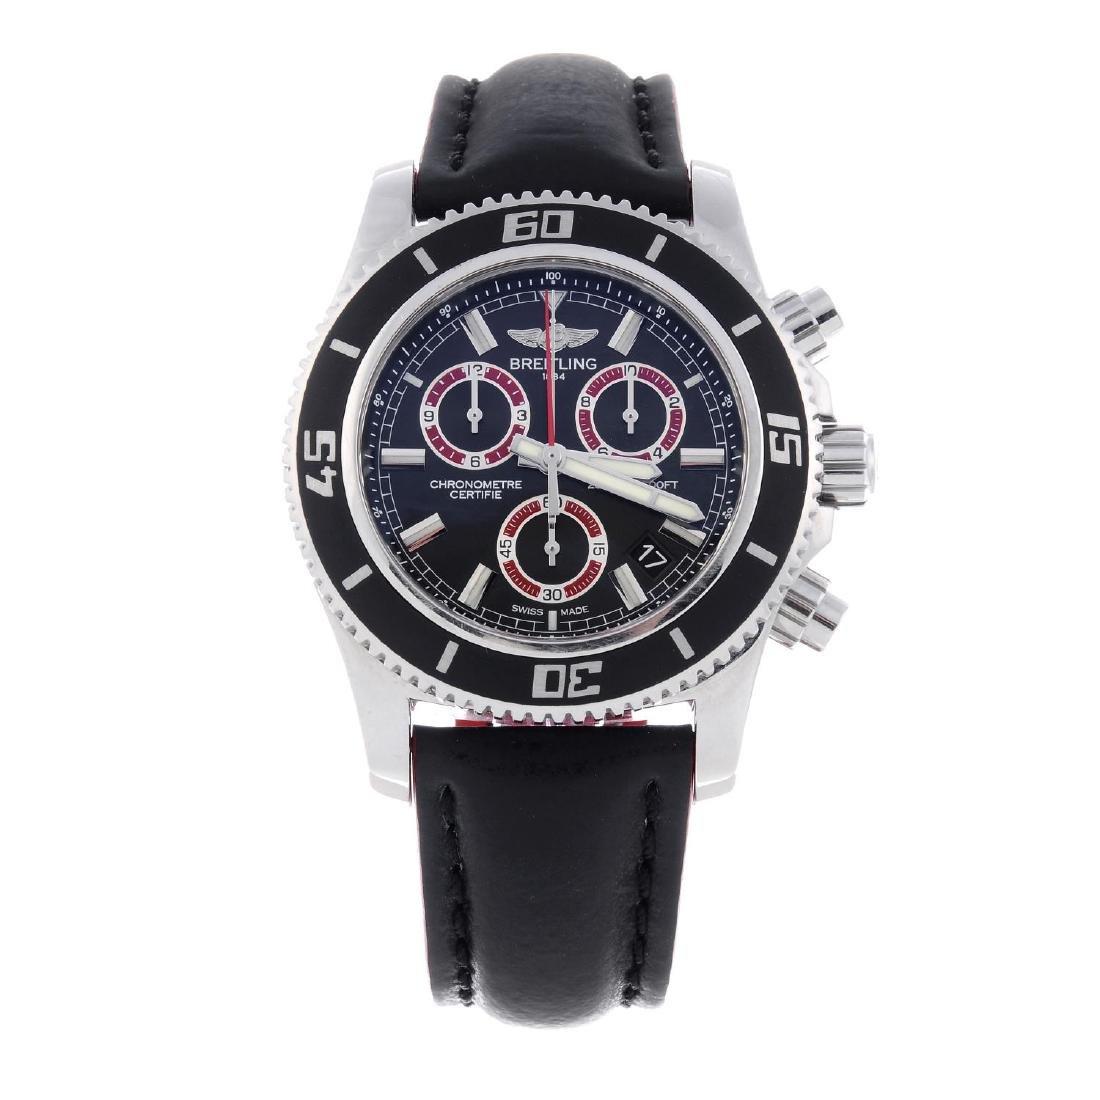 BREITLING - a gentleman's SuperOcean chronograph wrist